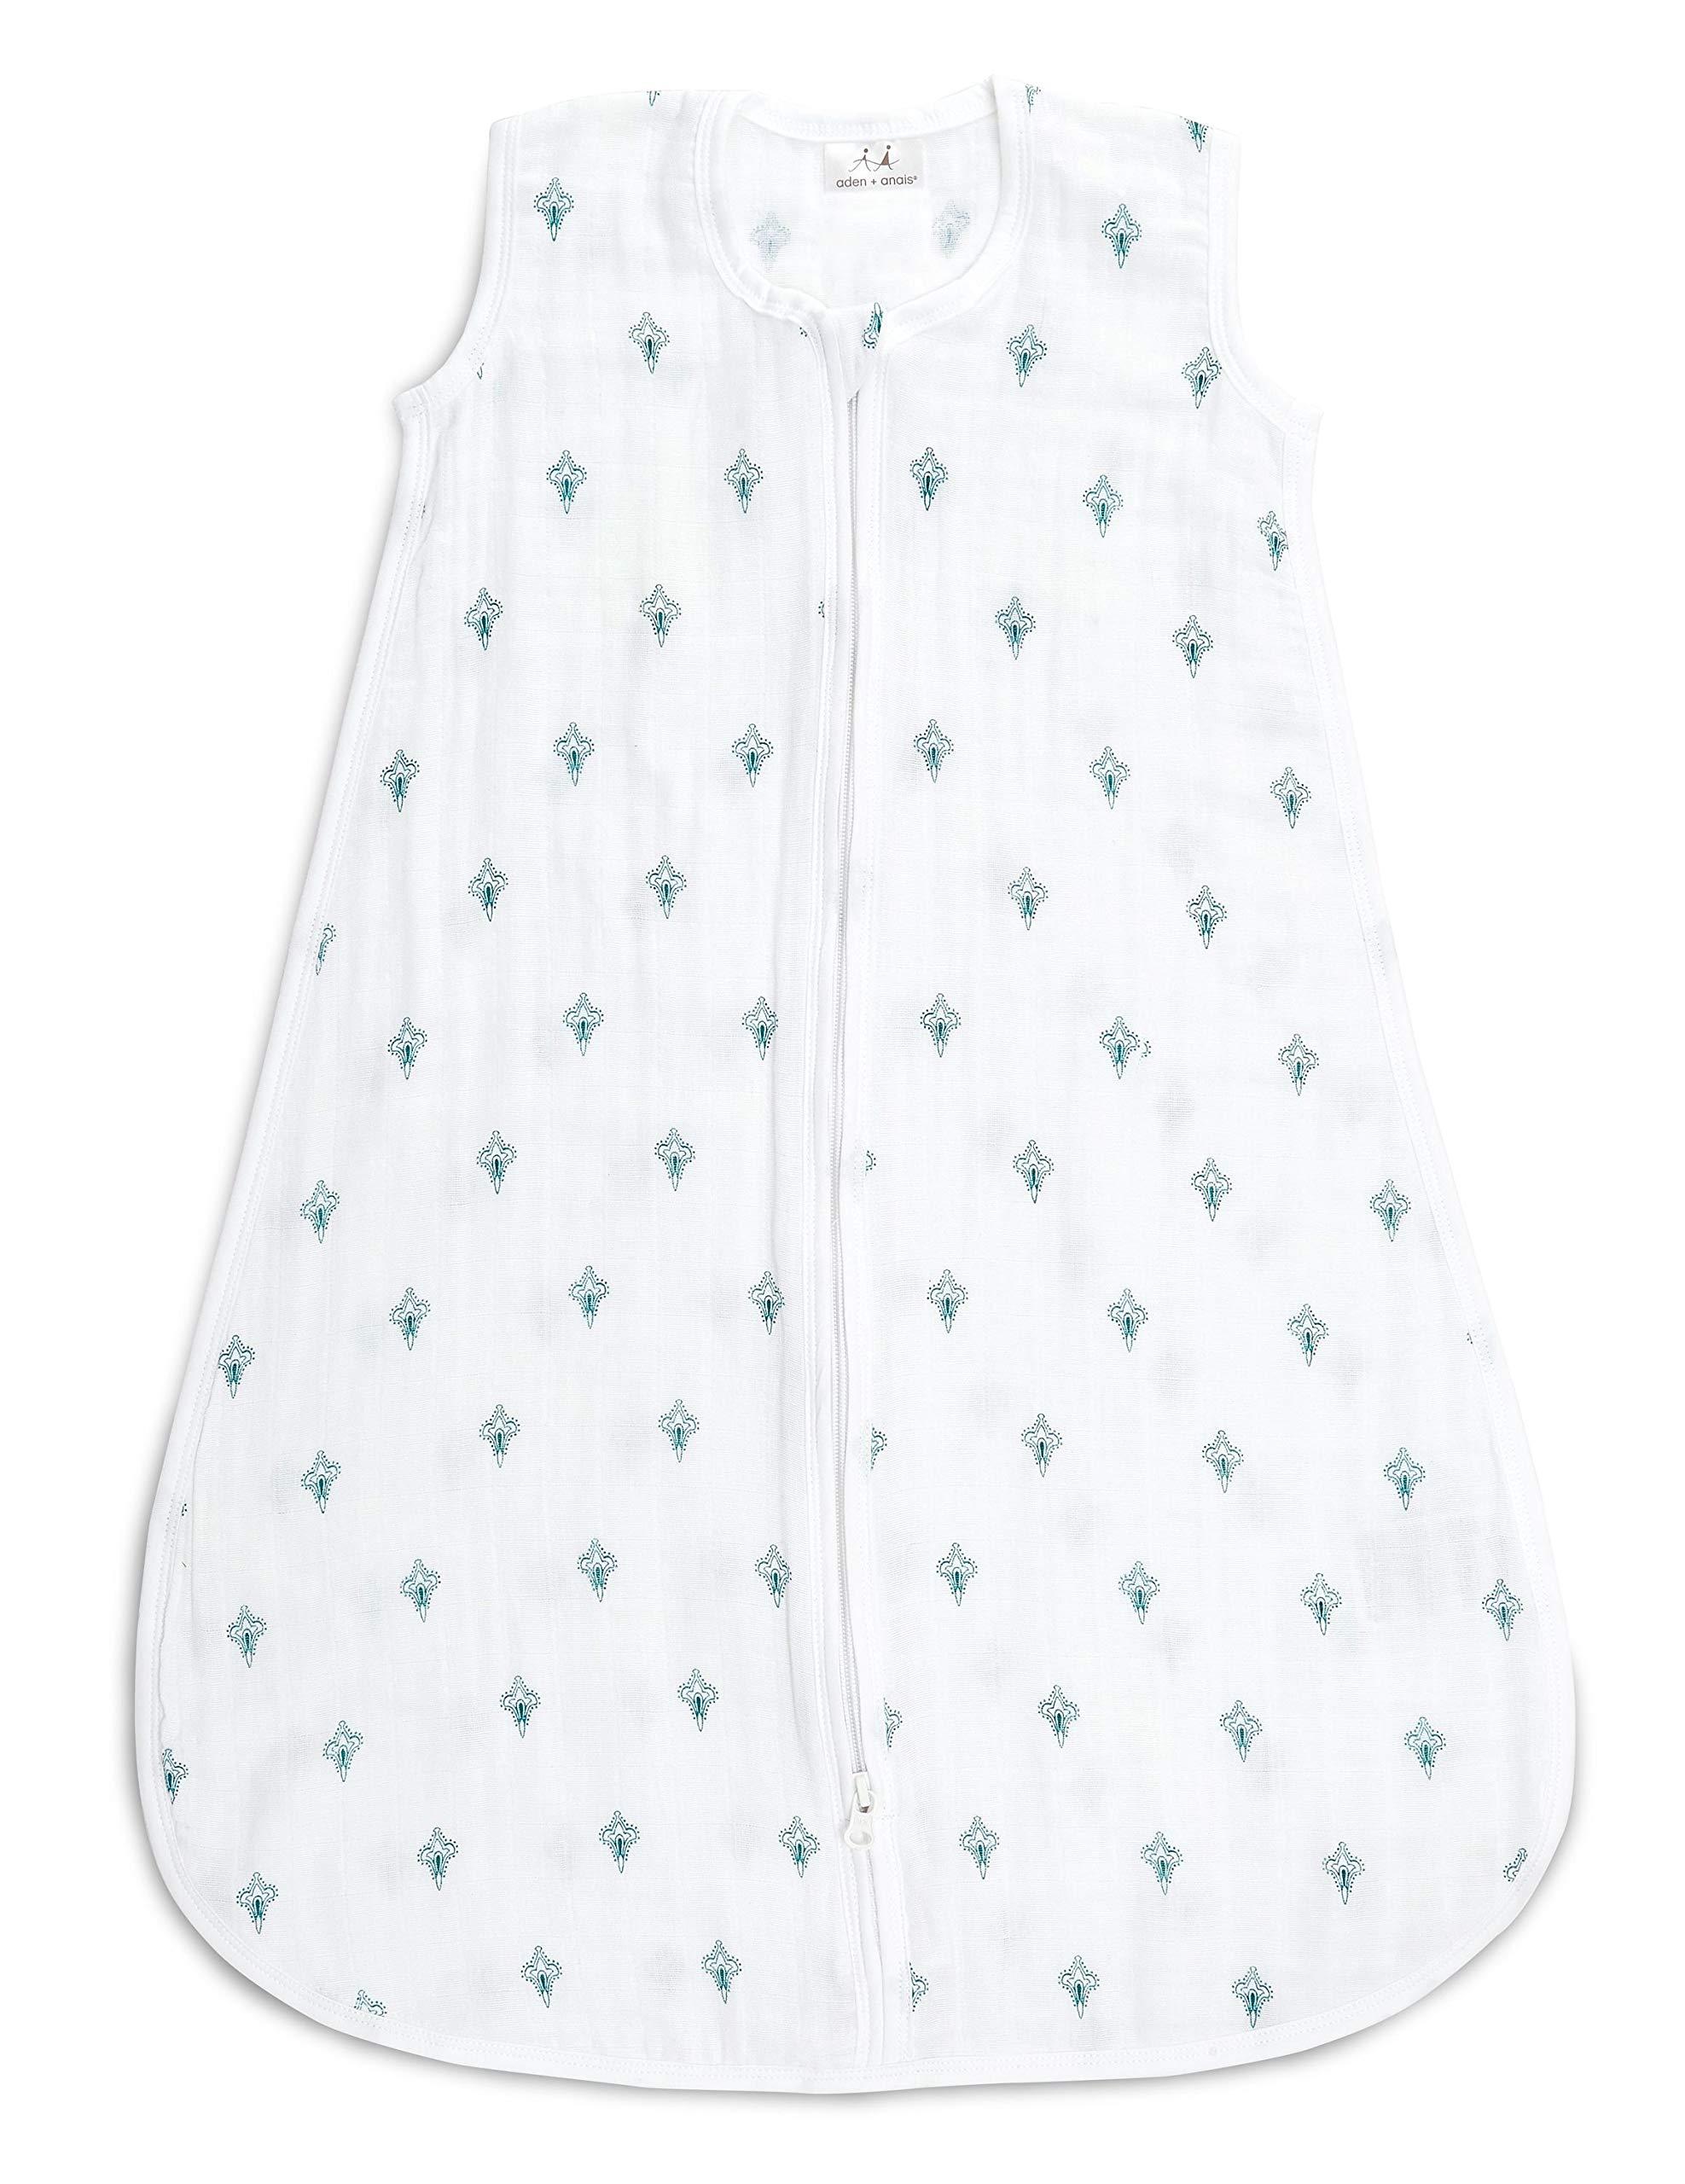 aden + anais Classic Sleeping Bag, Paisley - Teal - Paisley Drip, Large